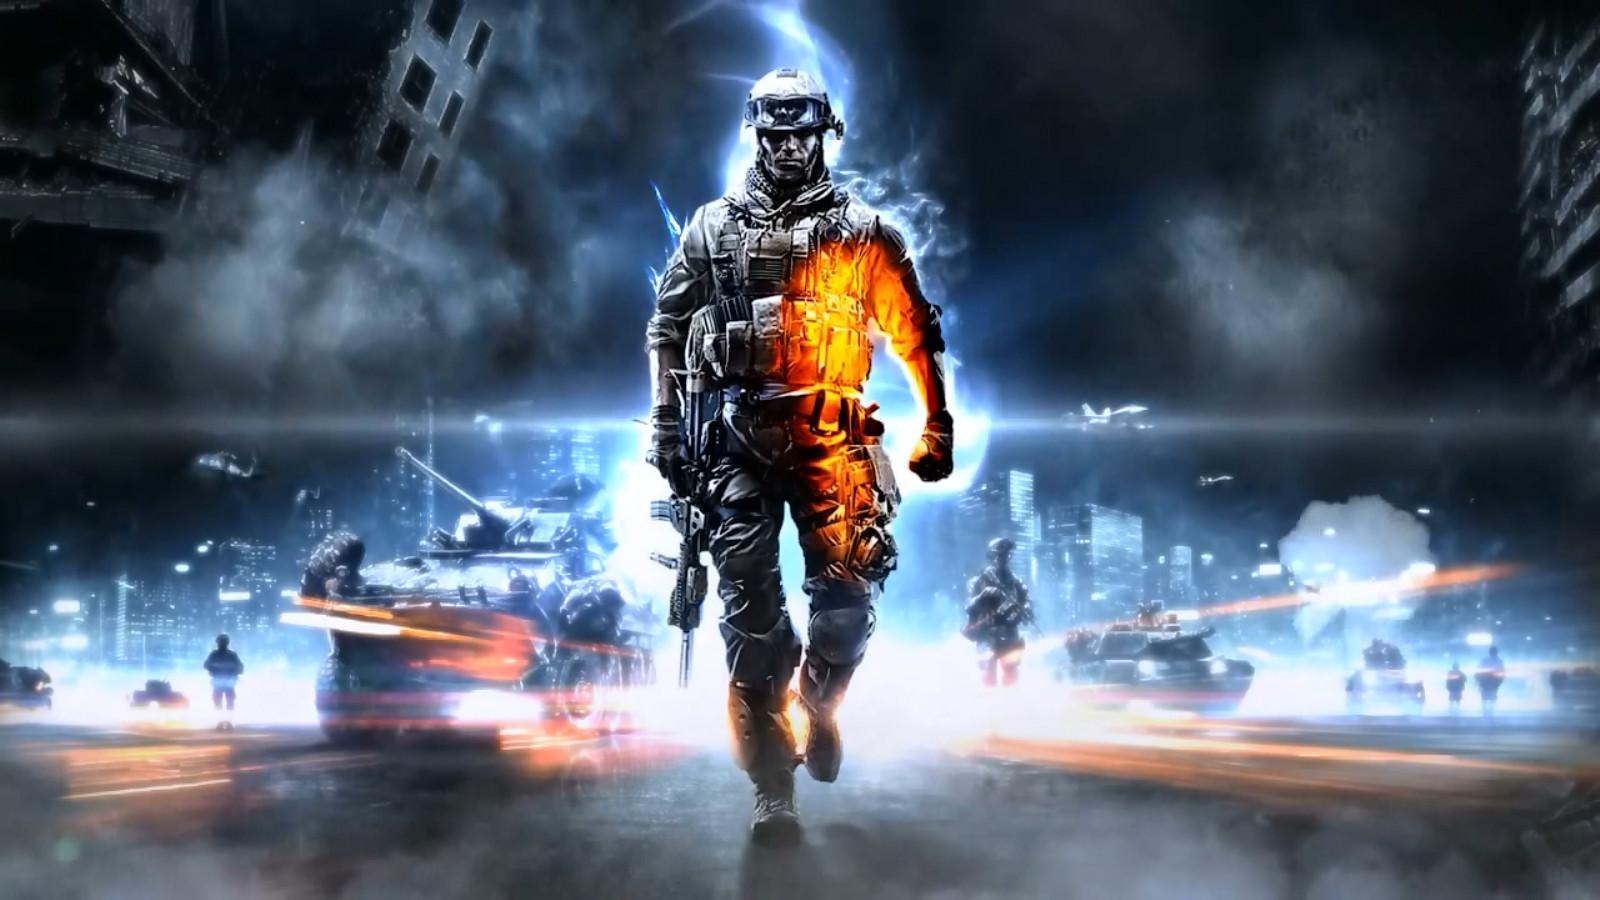 Battlefield 3 Dynamic (1280x720 10.92 Mb) - Видео обои ...: 7themes.su/photo/video_oboi/igry/battlefield_3_dynamic/7-0-2